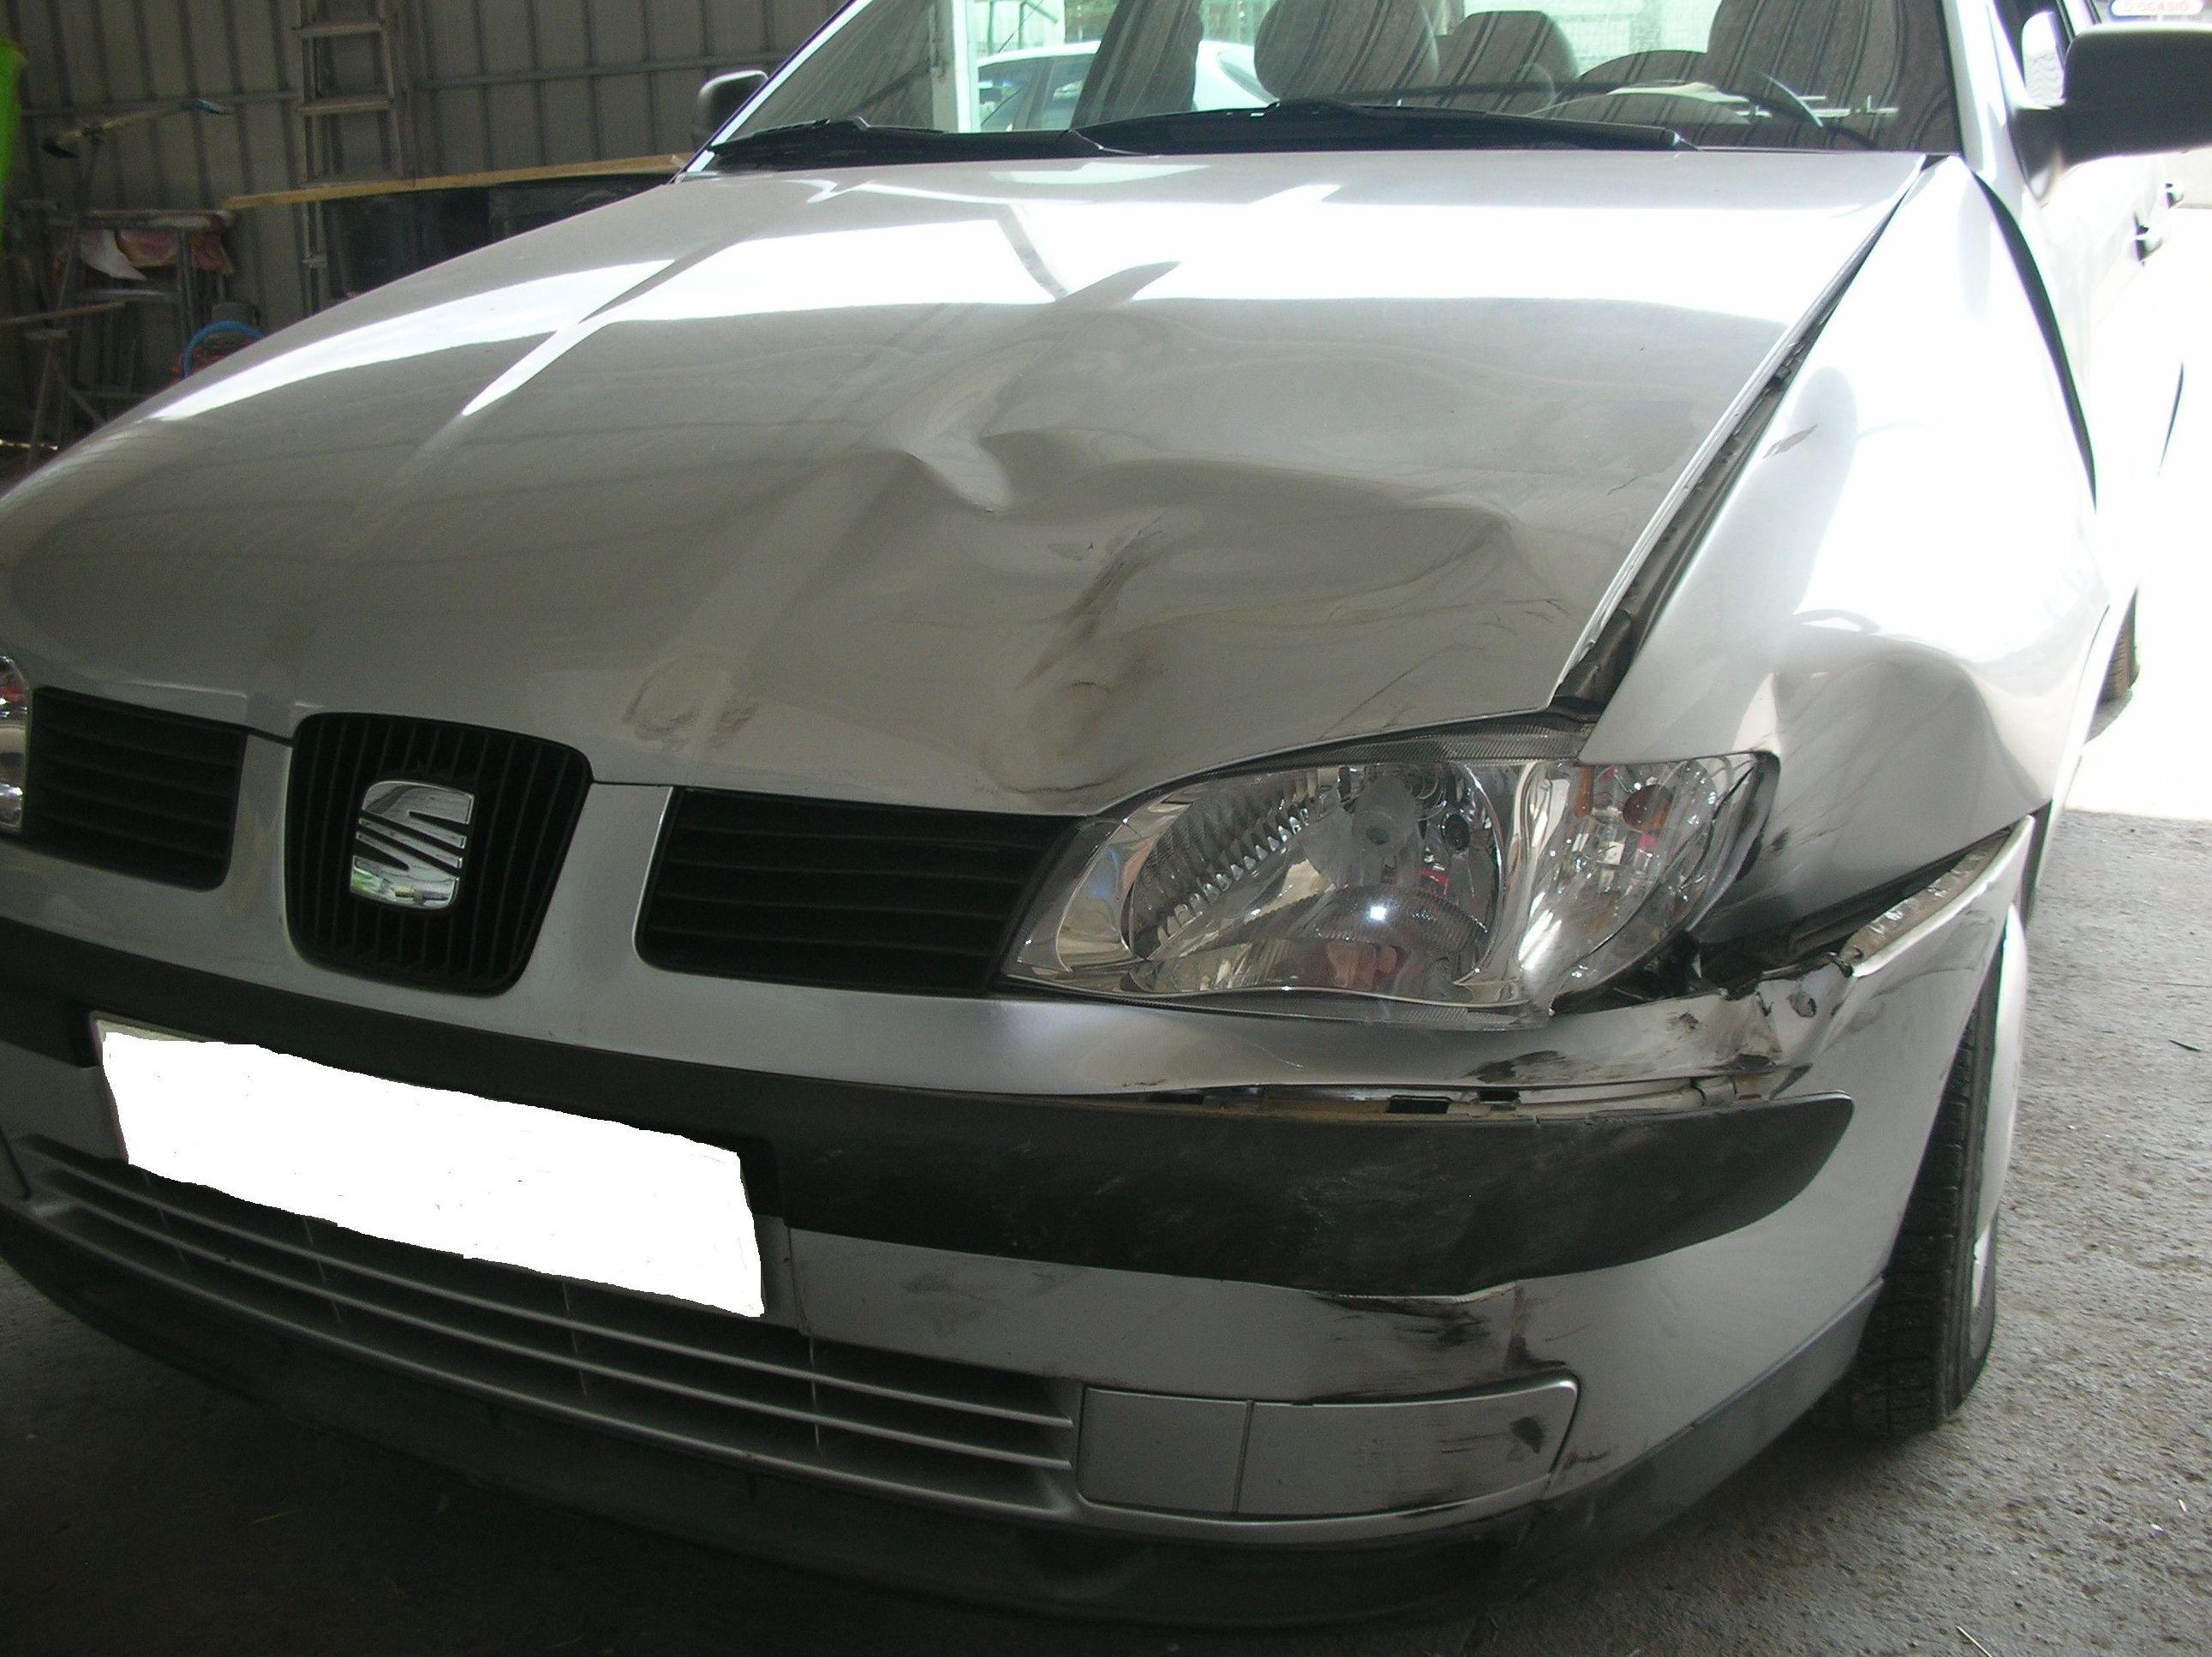 Vehicle abans de reparar.